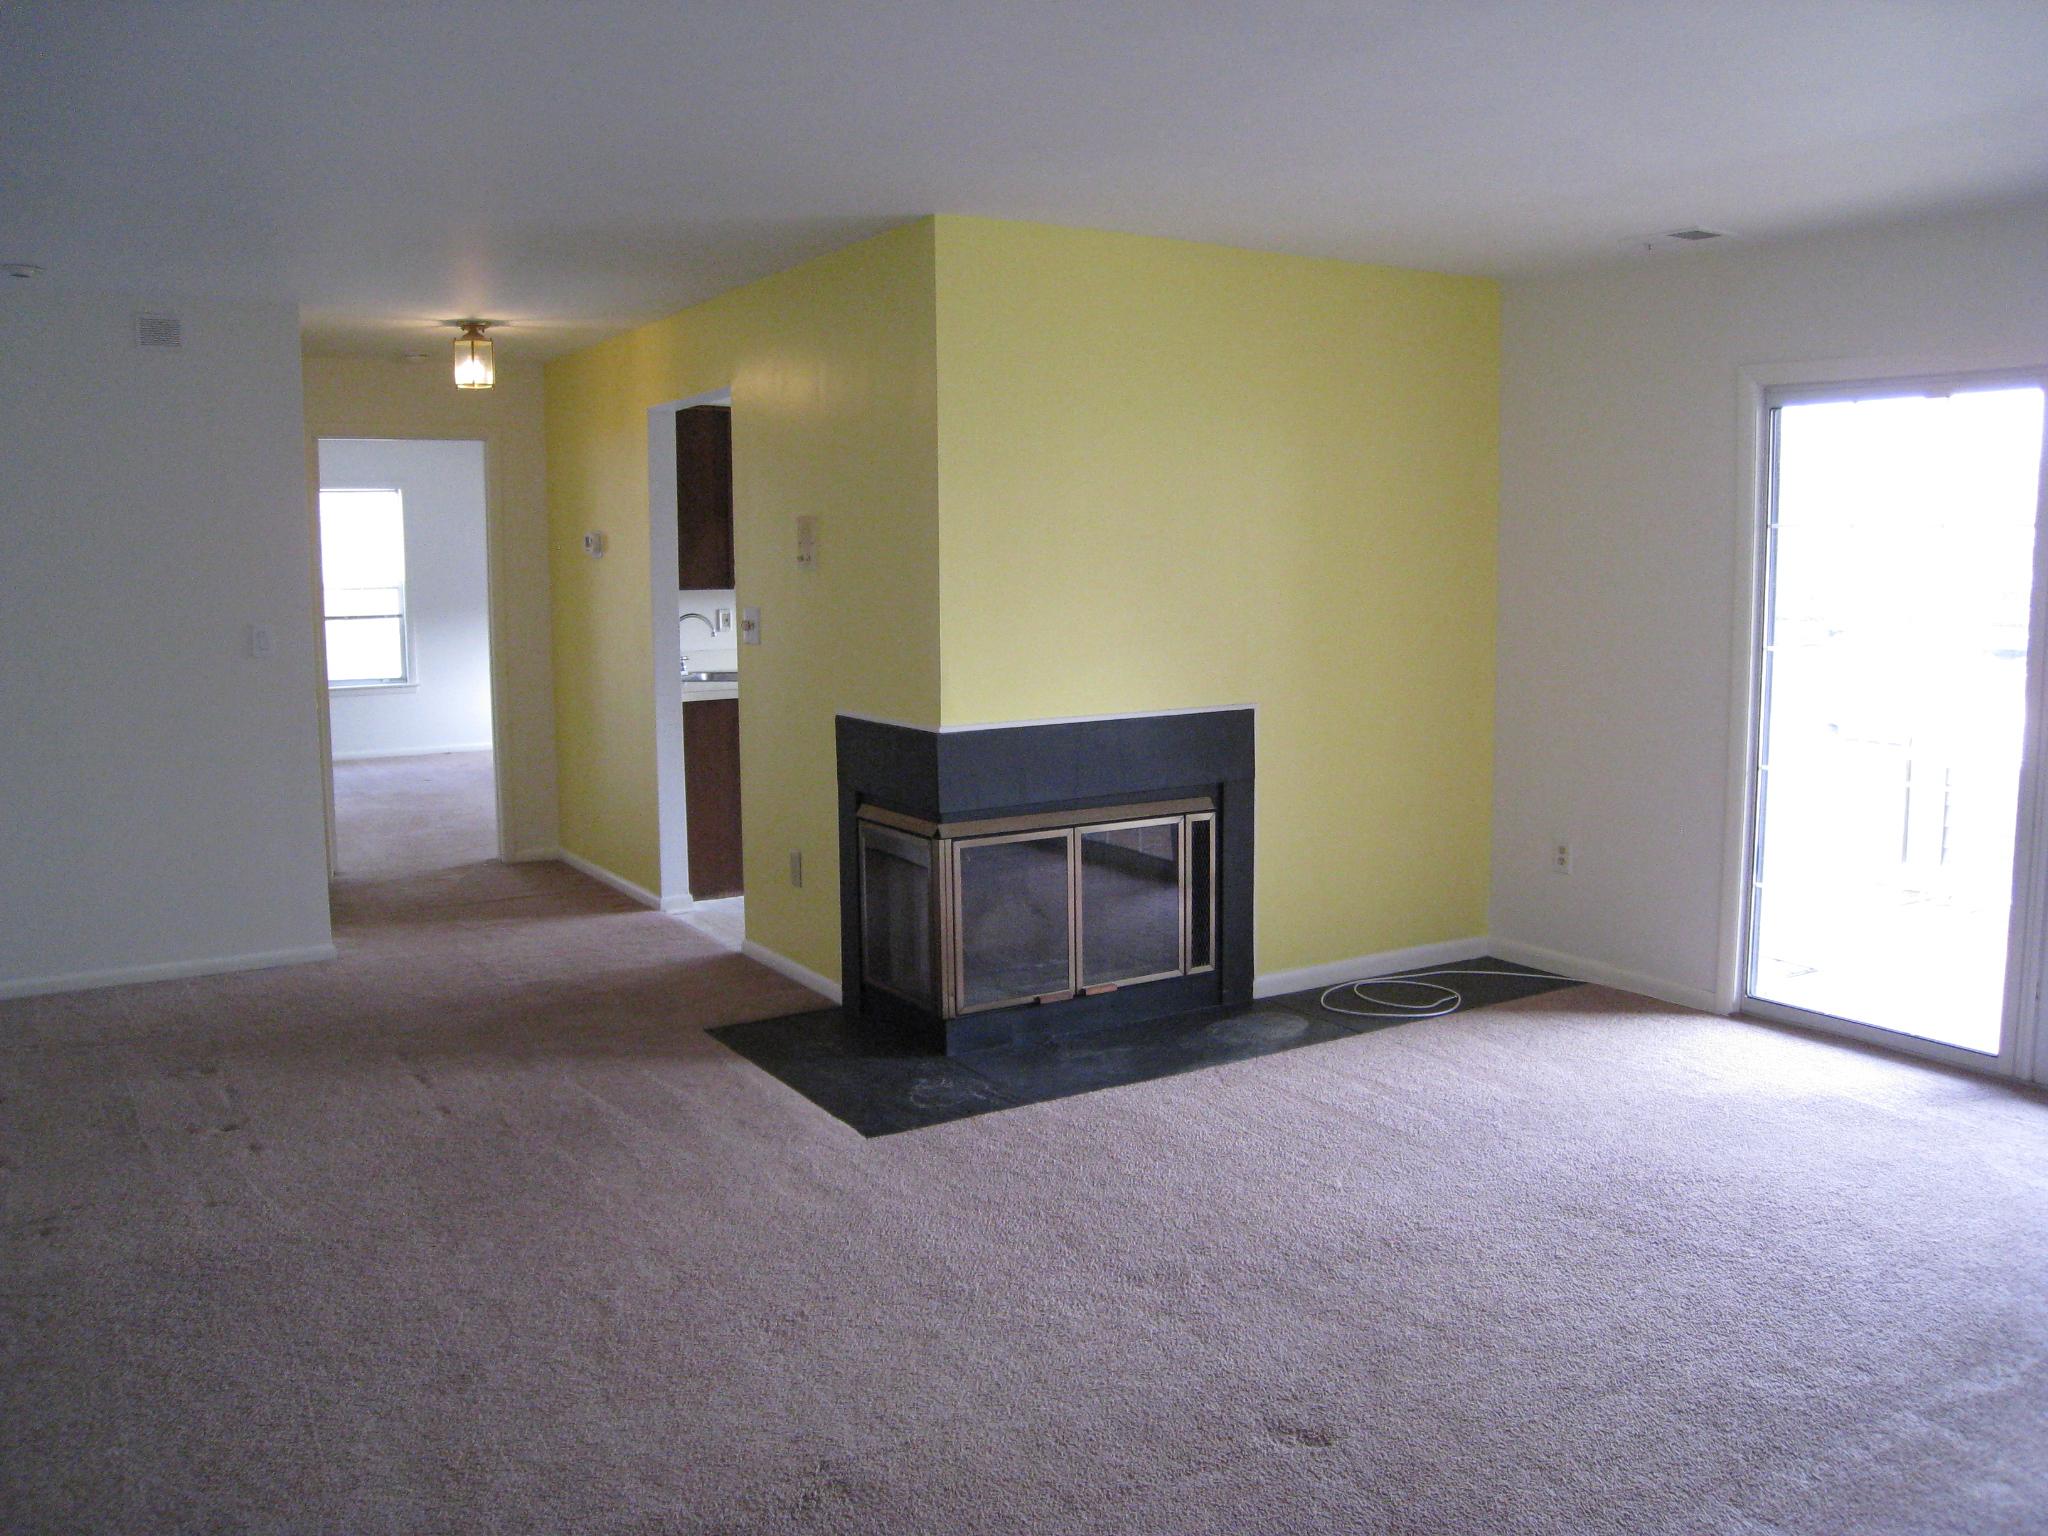 rentals property at 2nd Floor Cloister Model - West Windsor Township